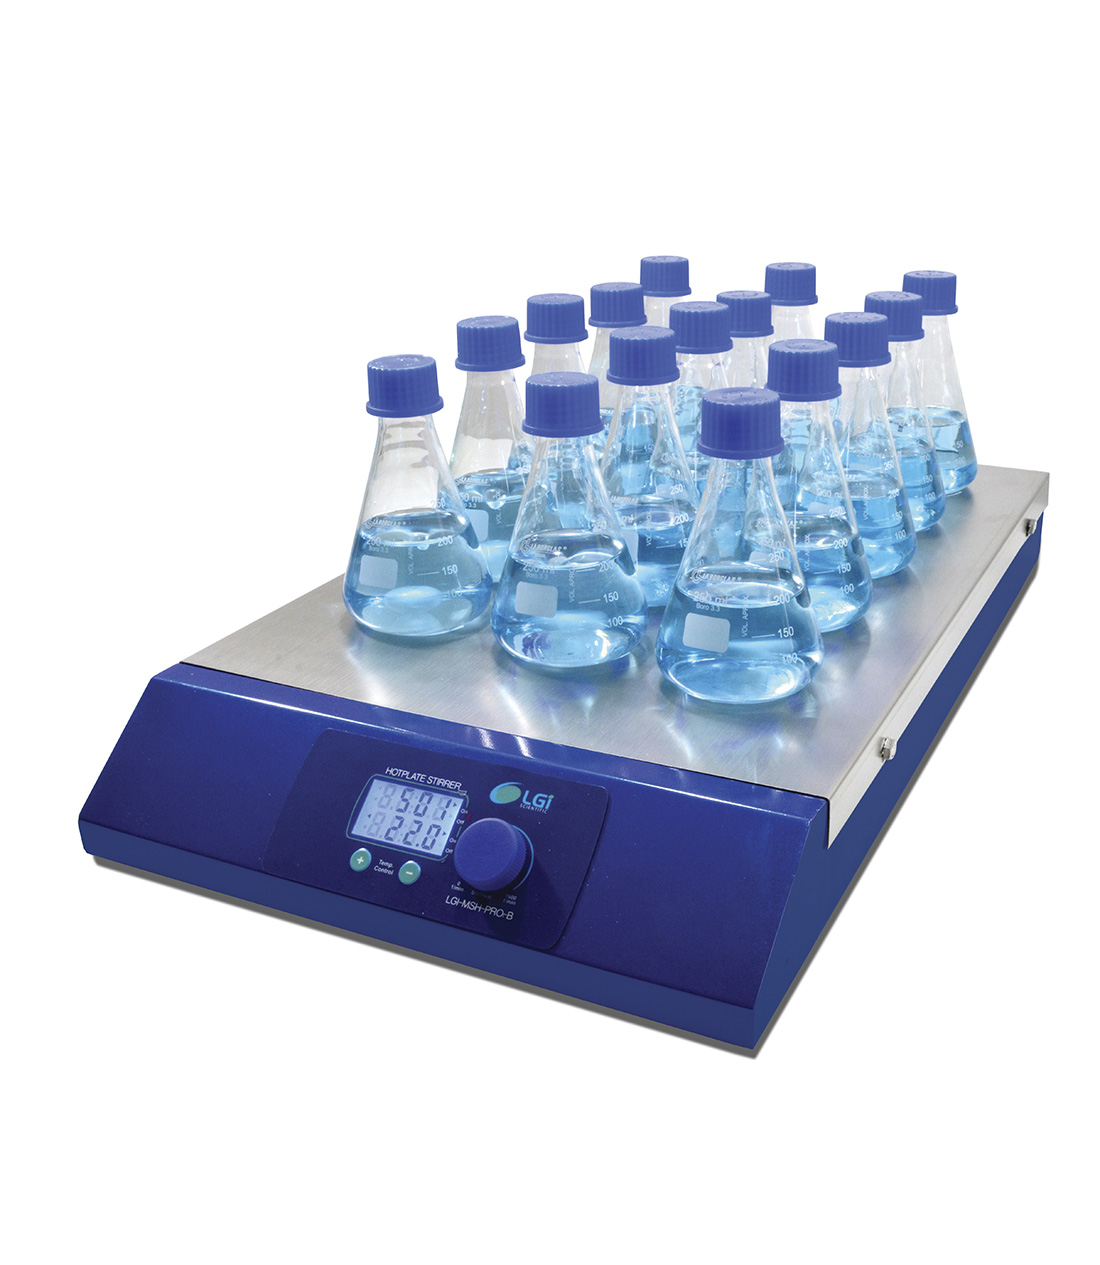 AGITADOR MAGNETICO MULTIPOSICAO COM AQUECIMENTO 15 - LGI SCIENTIFIC - Cód. LGI-MSH-PRO-15B